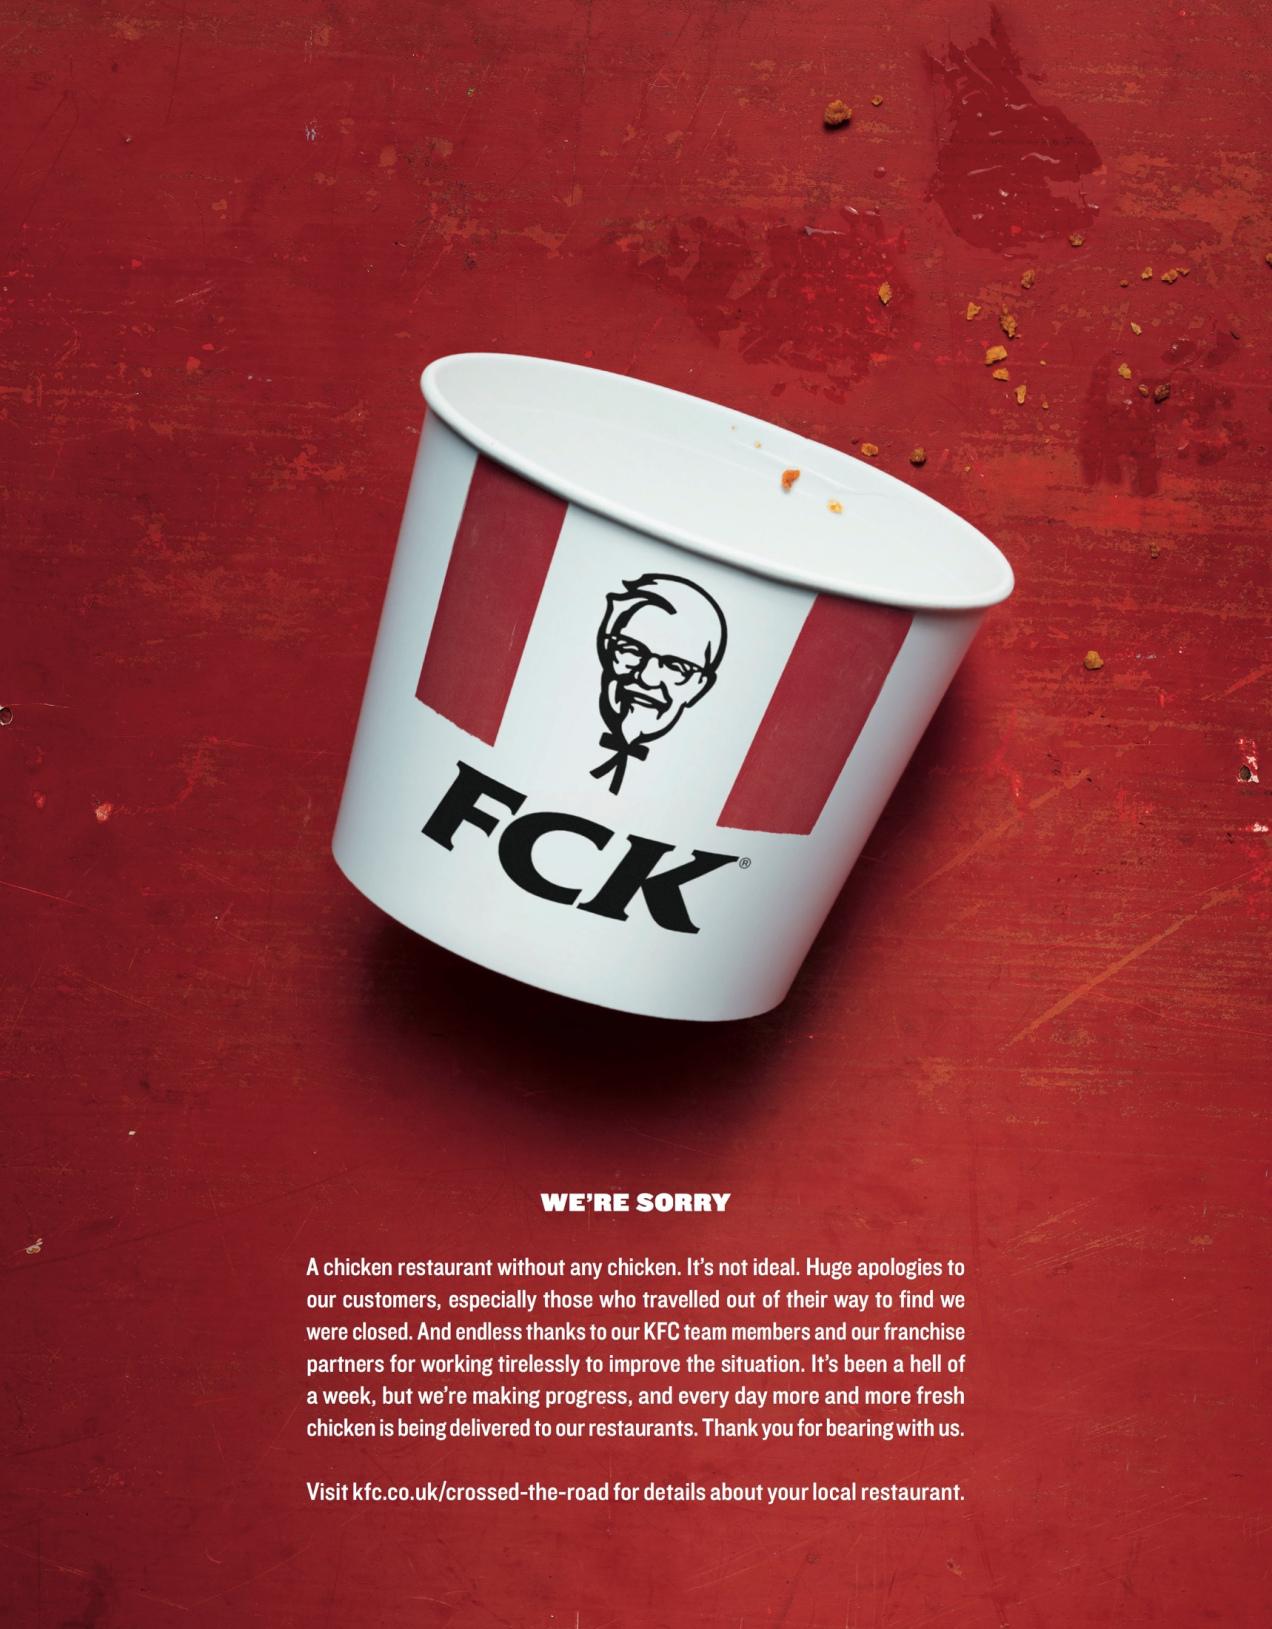 Damon Stapleton: Advertising. Norah Jones, KFC and forgiveness